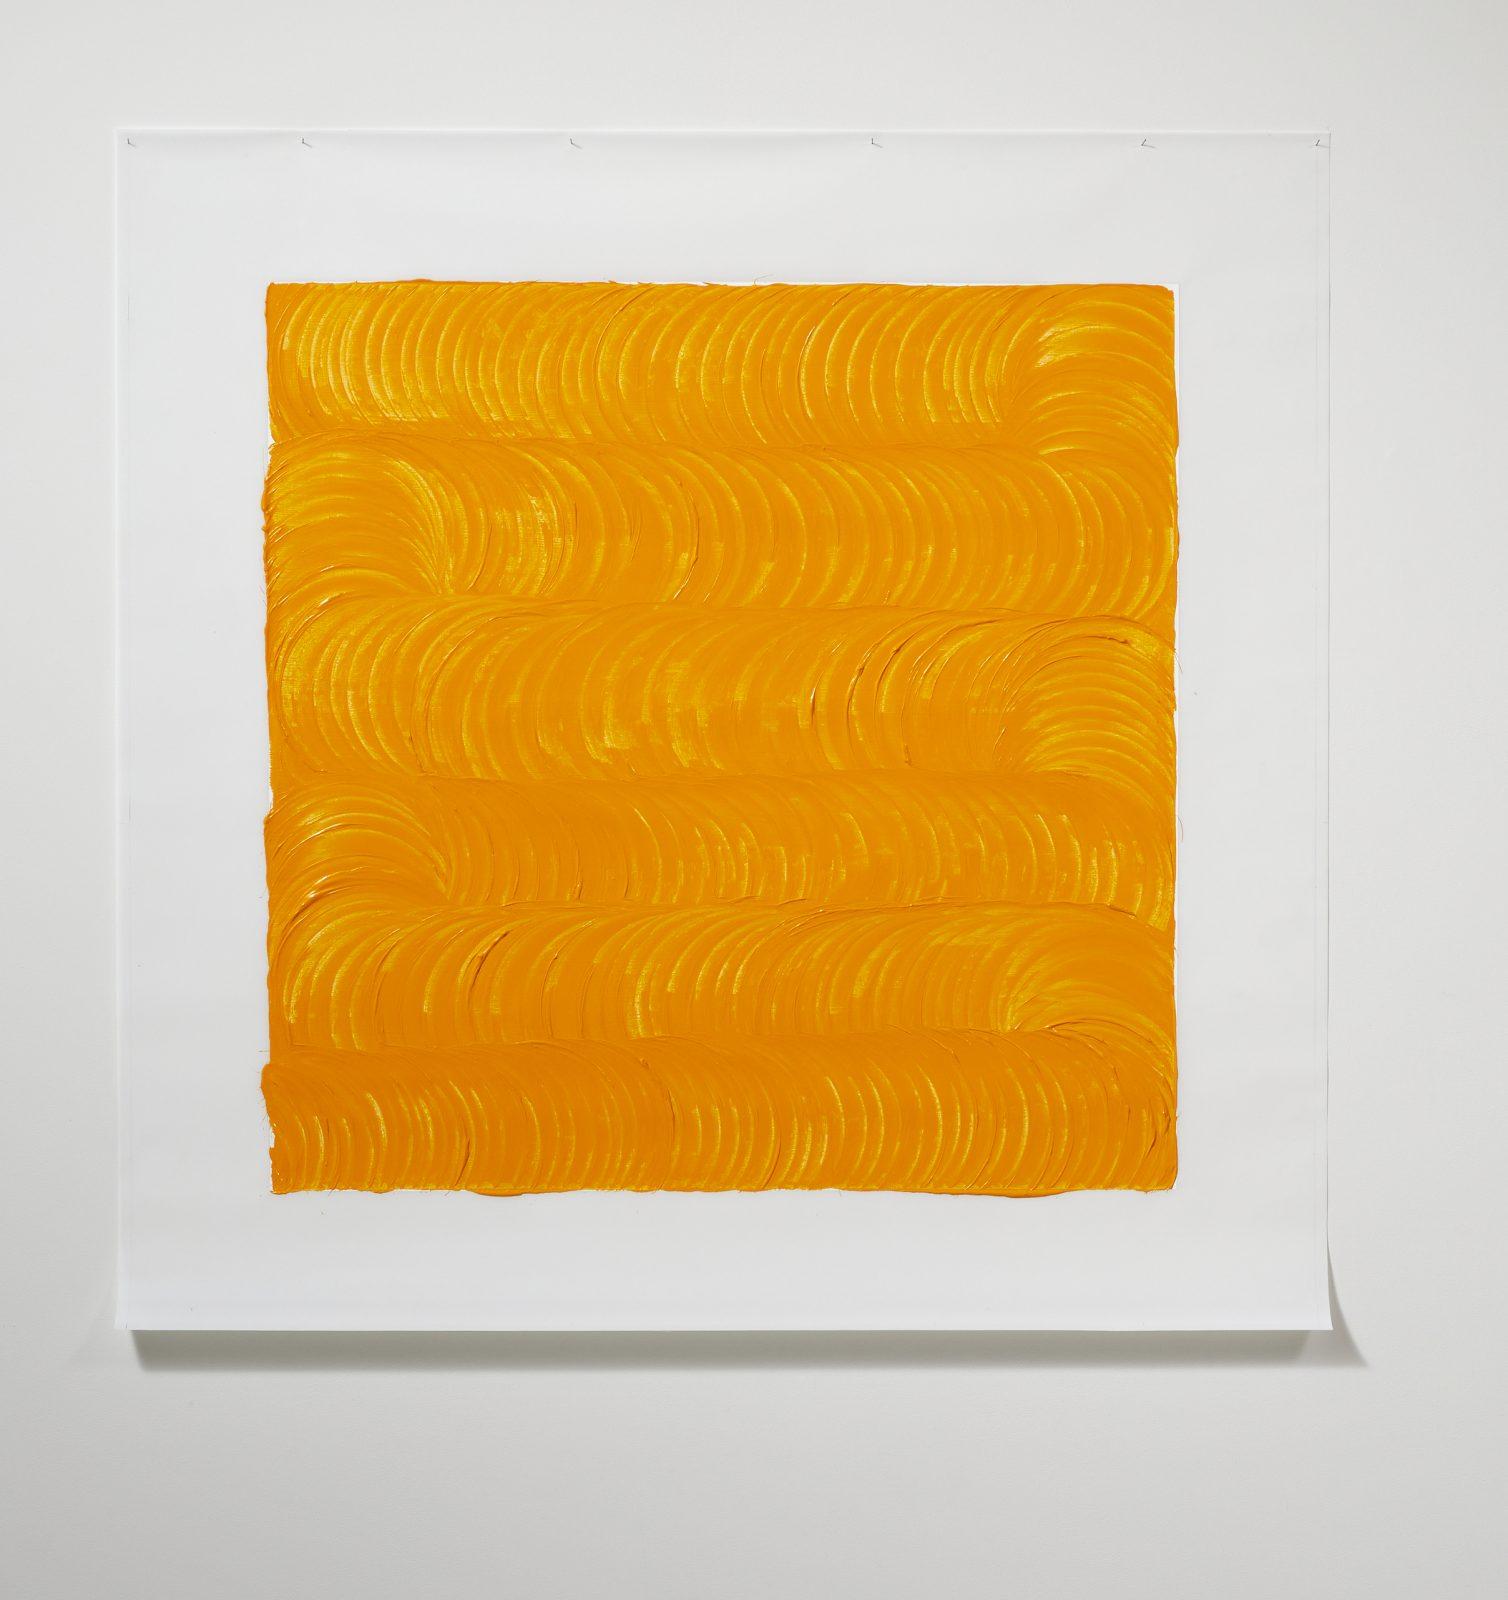 Noel Ivanoff featured artwork